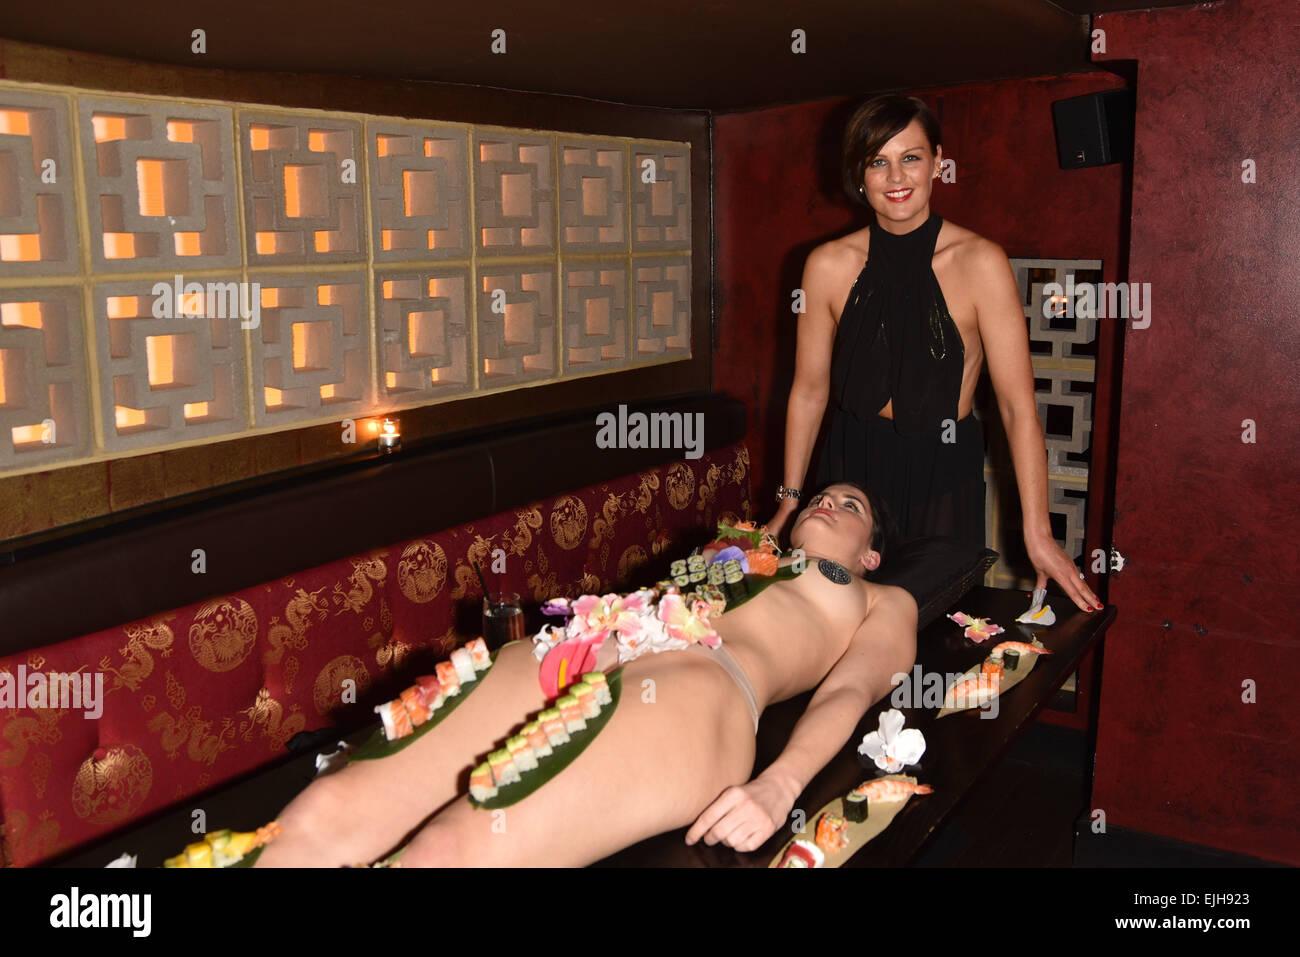 Nude scene from titanic